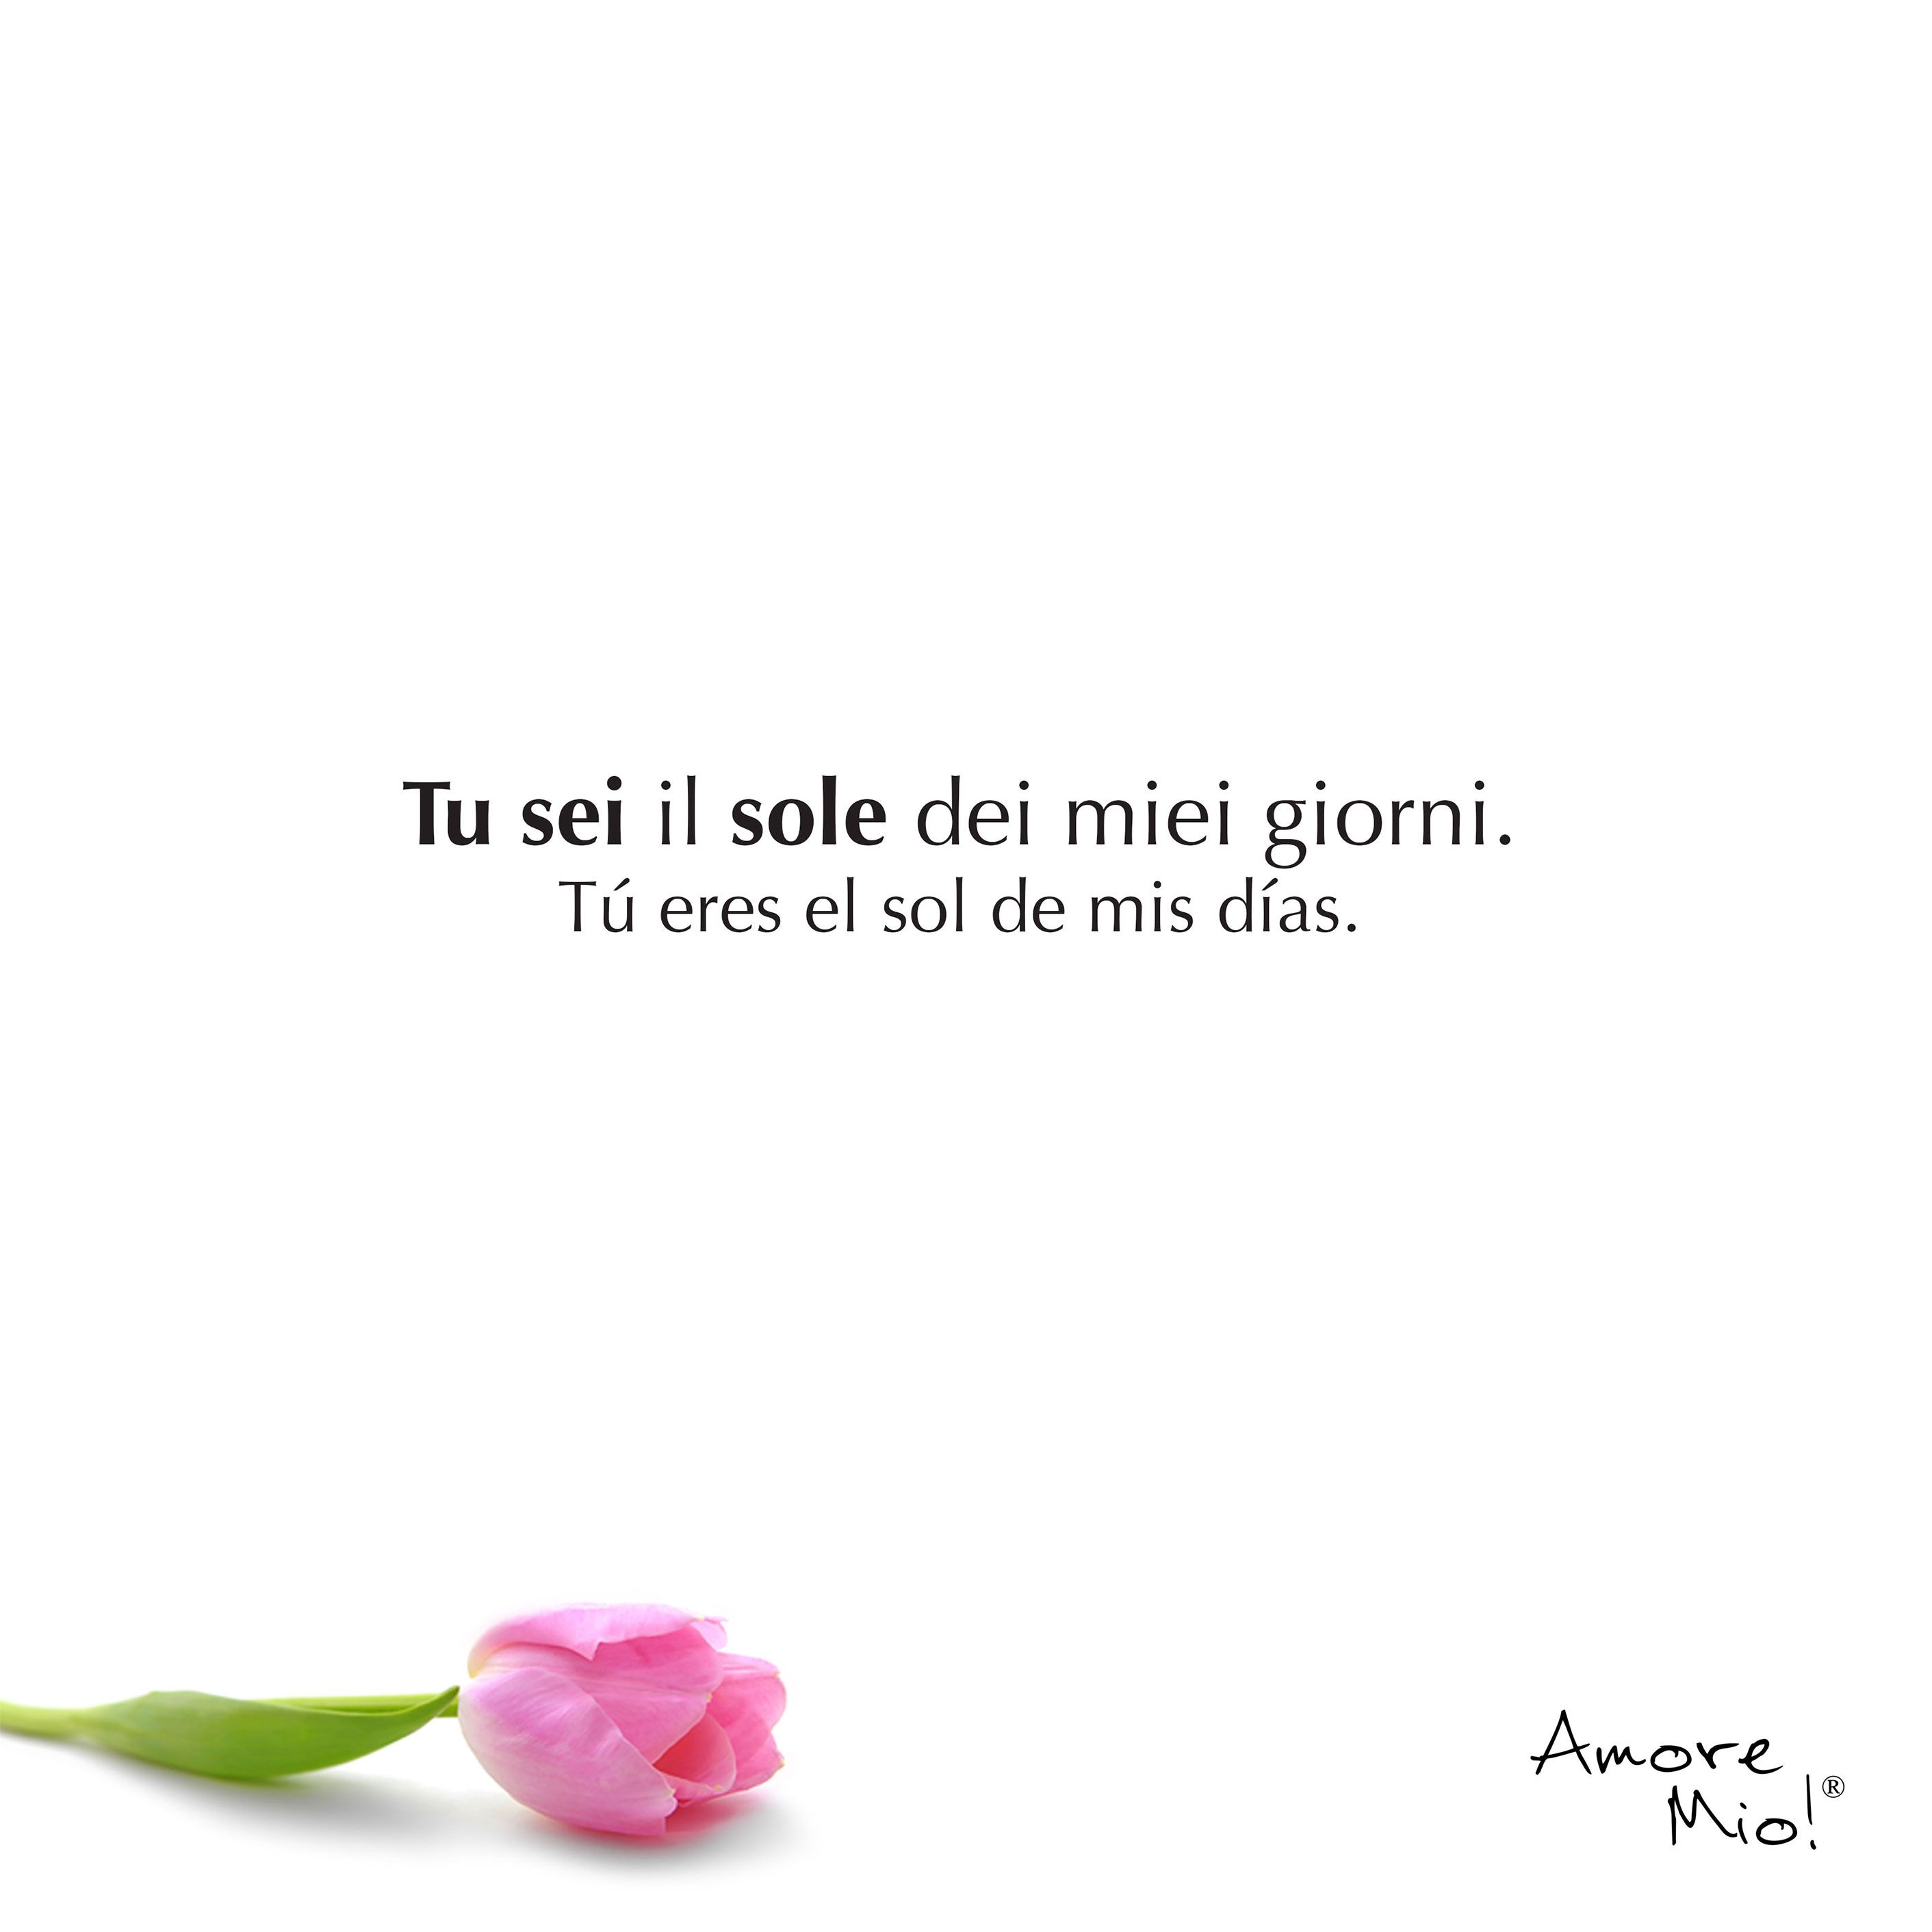 Frases cortas de Amor